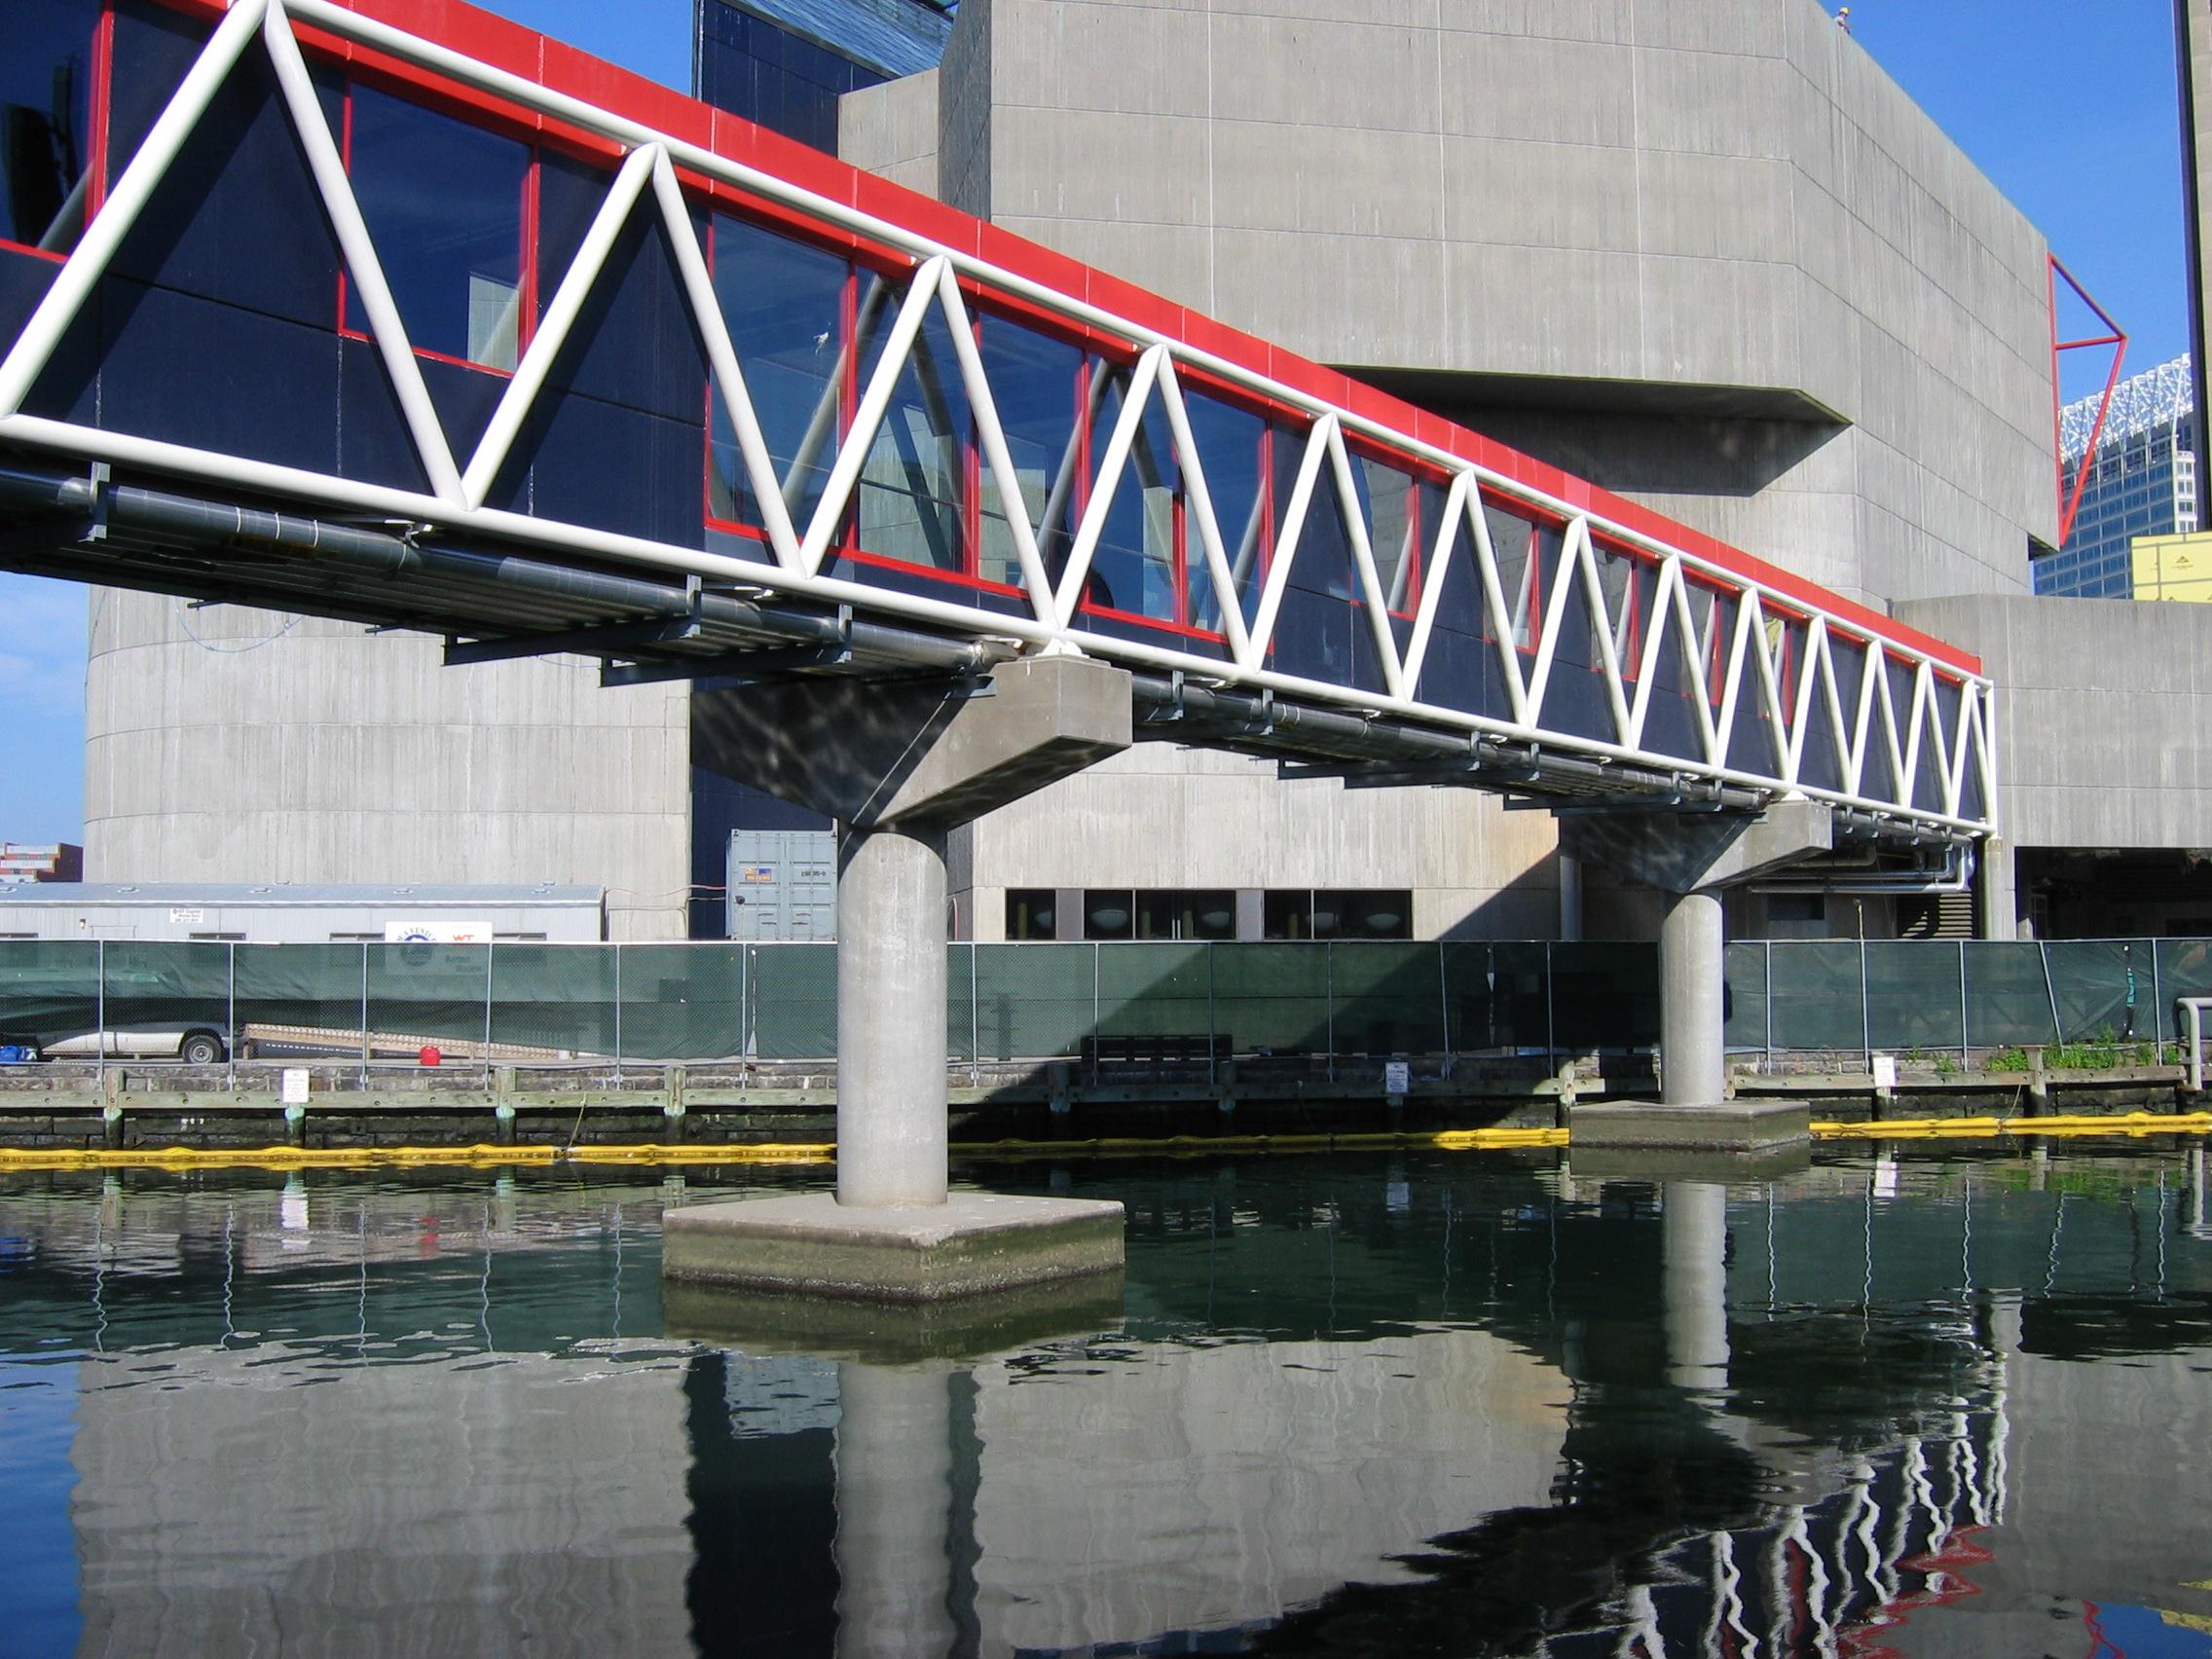 Engineer's Guide to Baltimore: National Aquarium in Baltimore